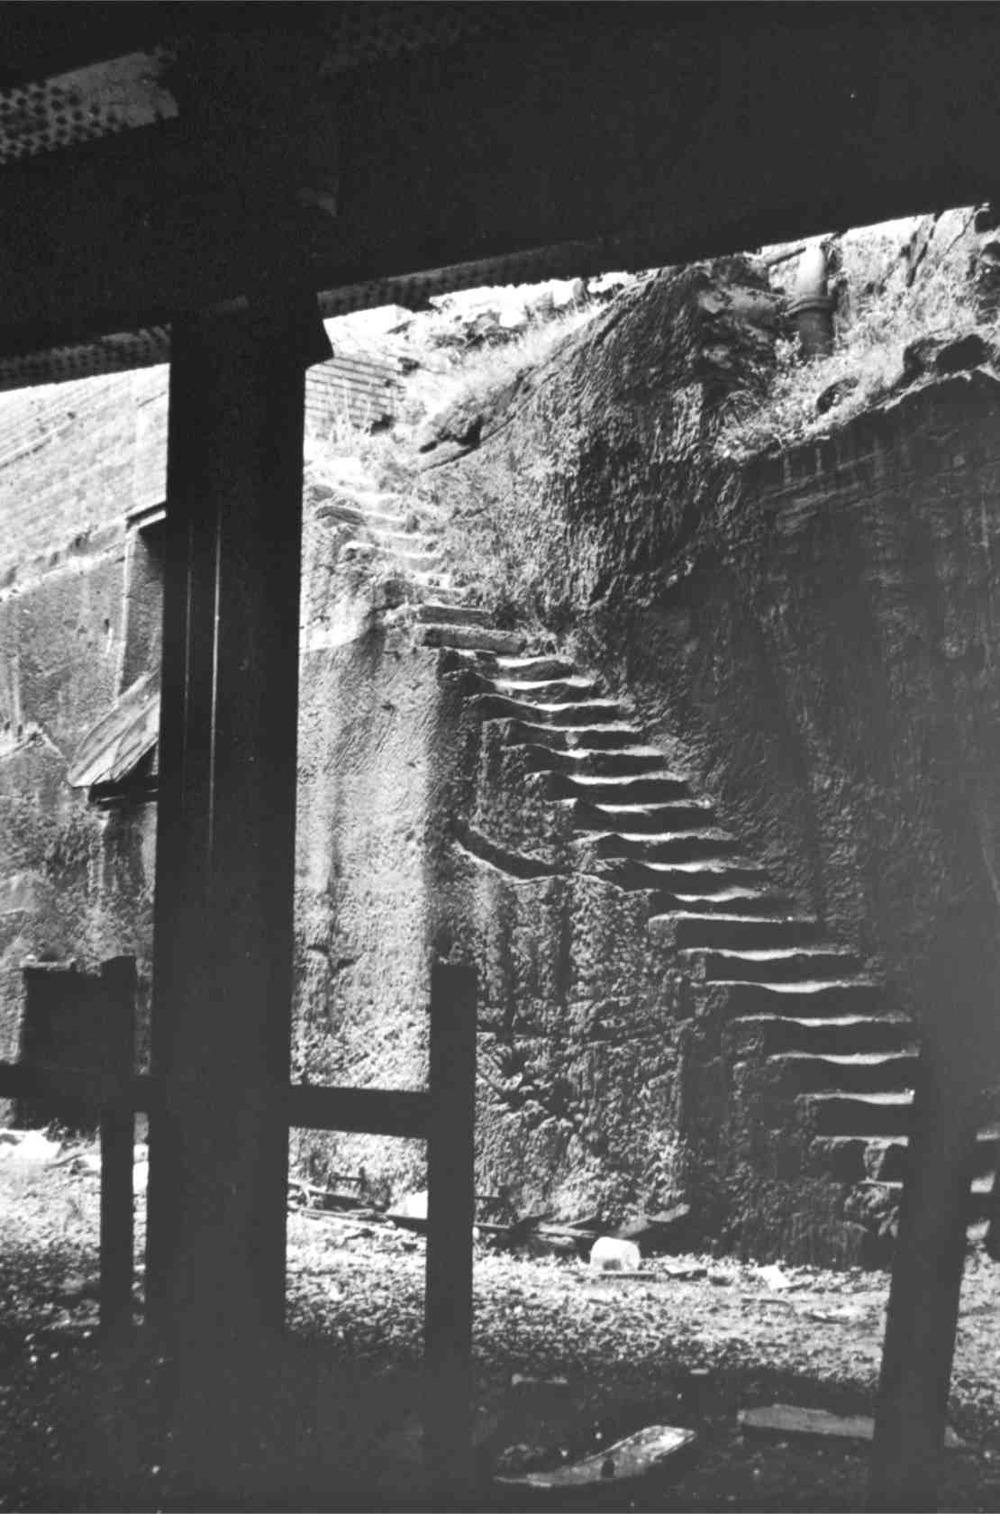 'Steps'